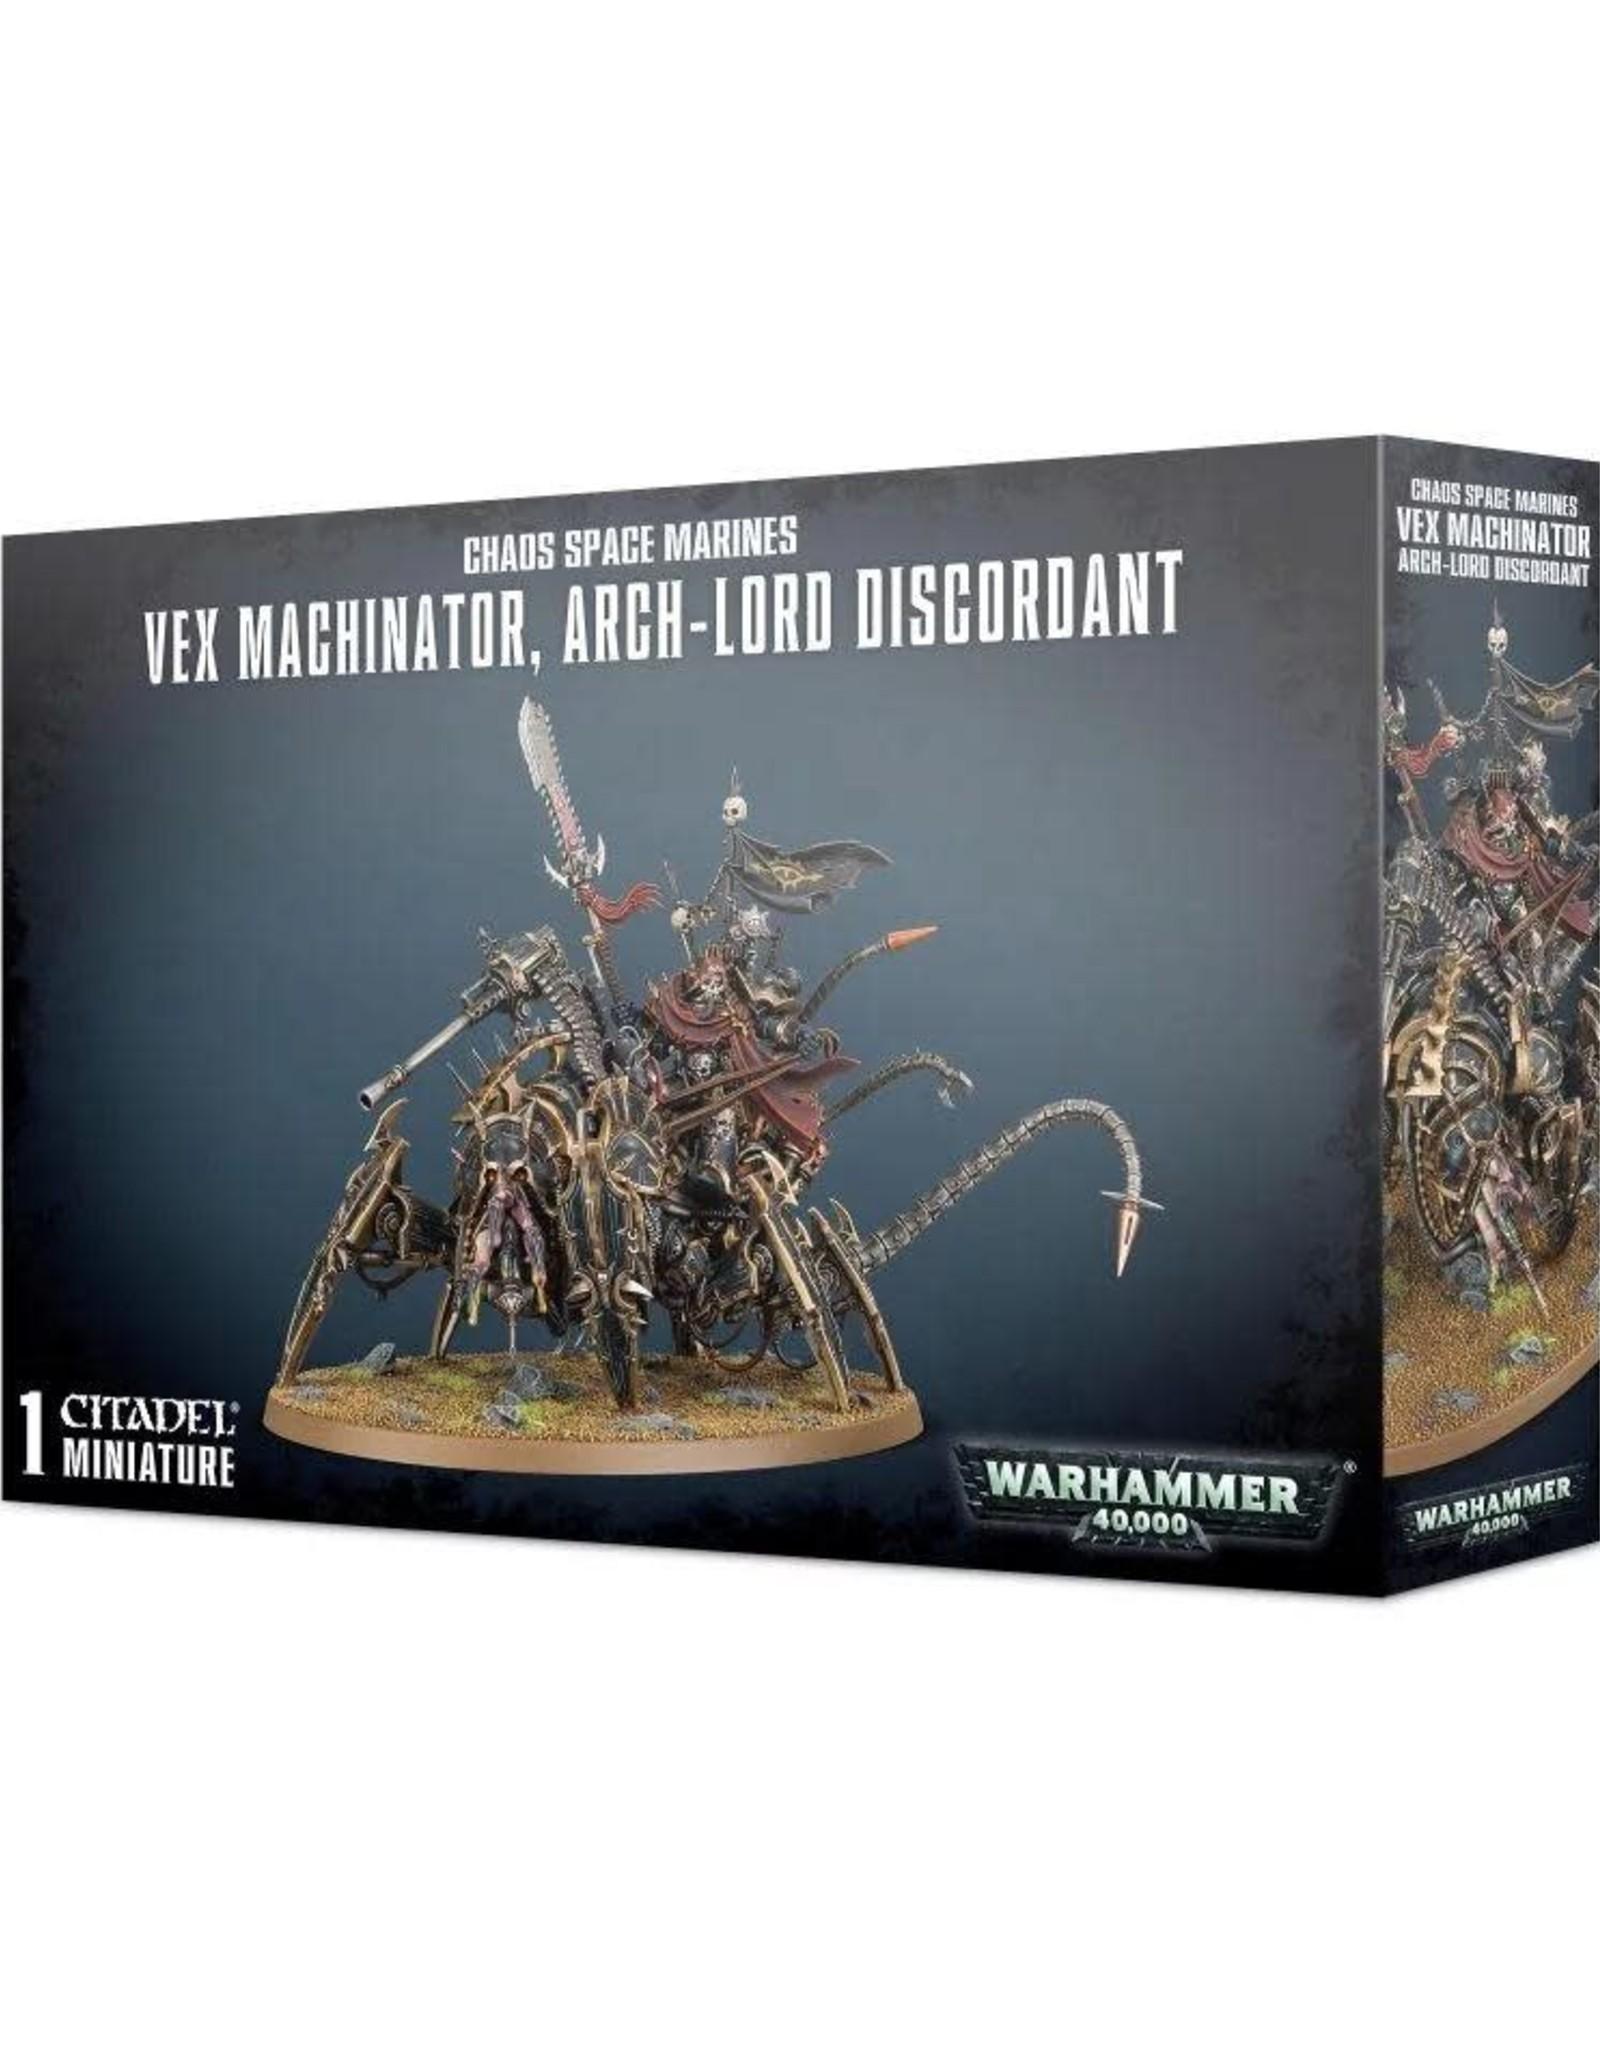 Warhammer 40K Chaos Space Marines Vex Machinator, Arch-Lord Discordant